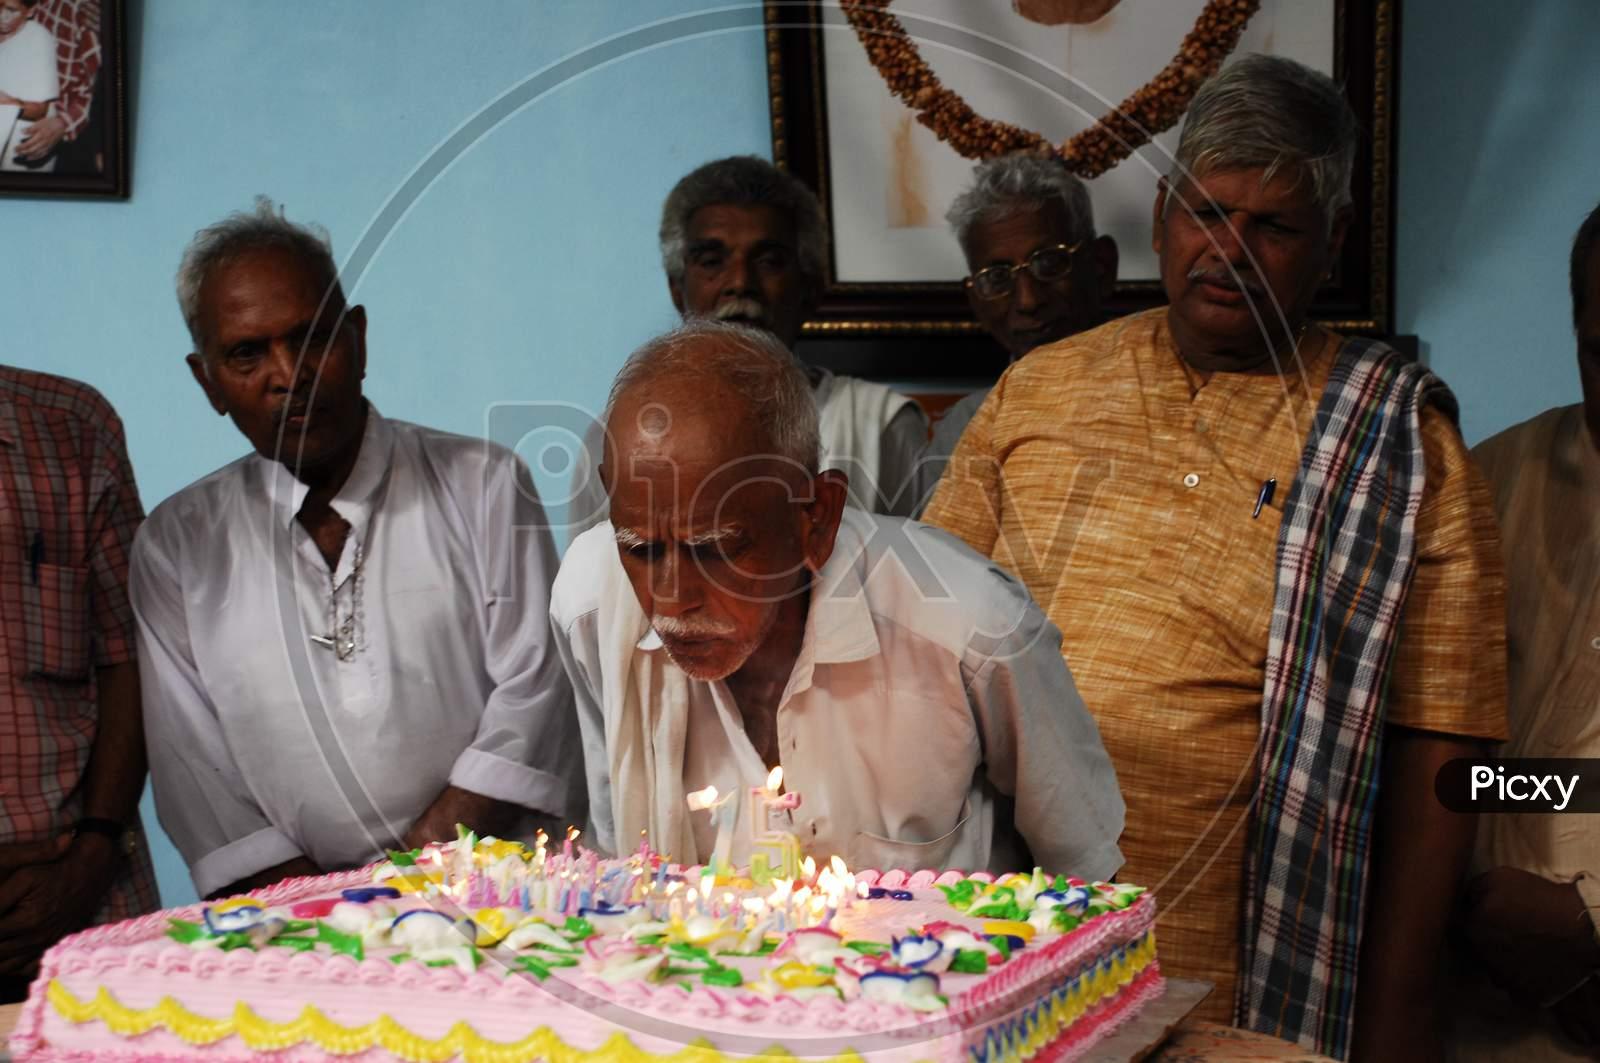 Strange Image Of An Old Man Cutting Birthday Cake Bs574132 Picxy Personalised Birthday Cards Veneteletsinfo